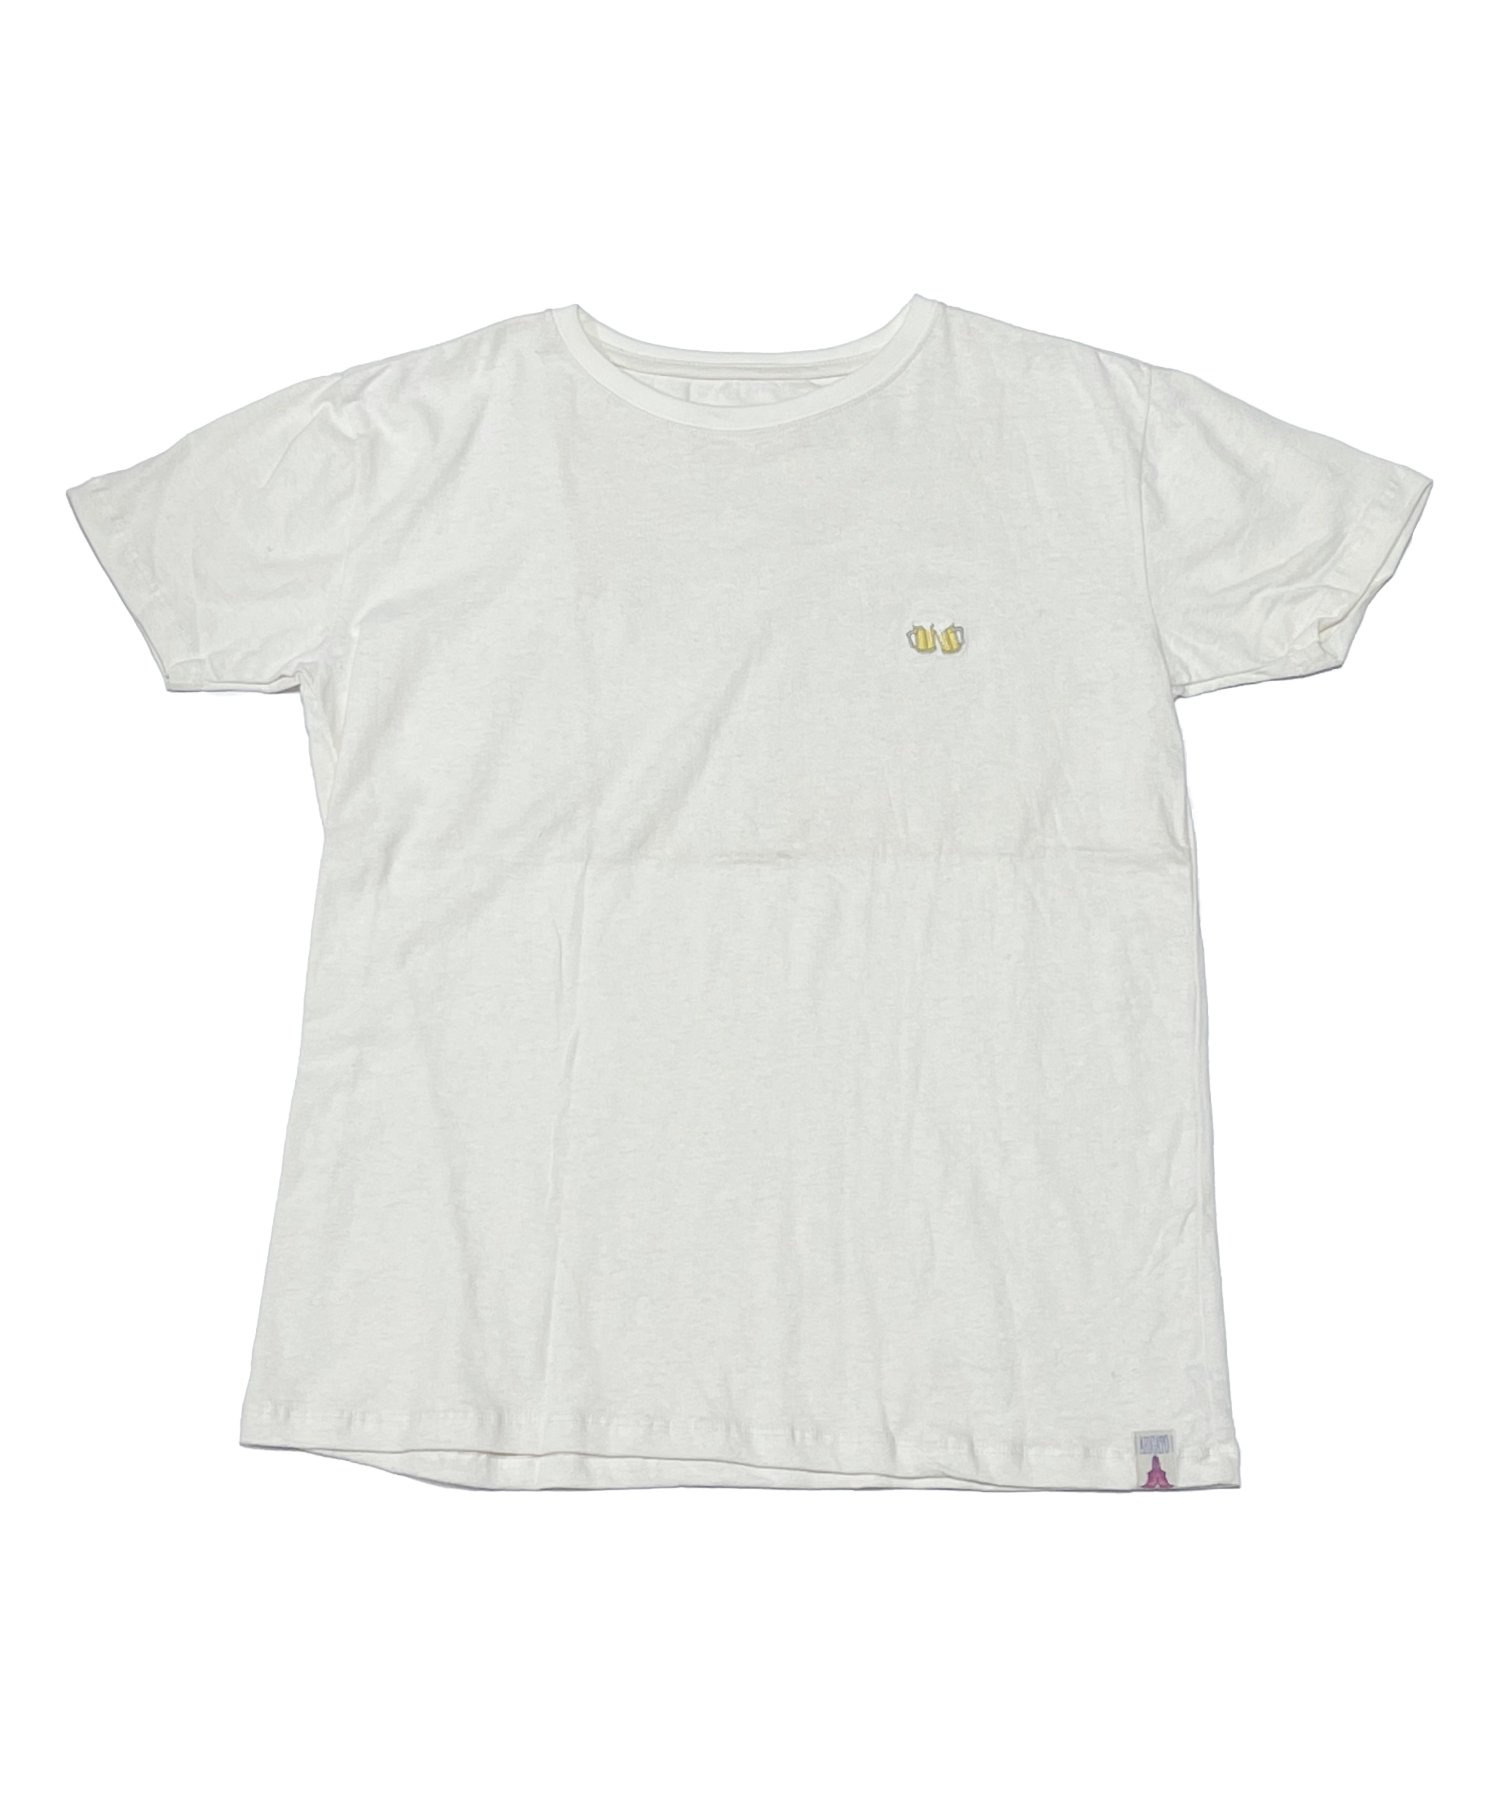 ARIGATO FAKKYU〔アリガトファッキュ〕 HEMP COTTON Tee POINT刺繍(6 colors)